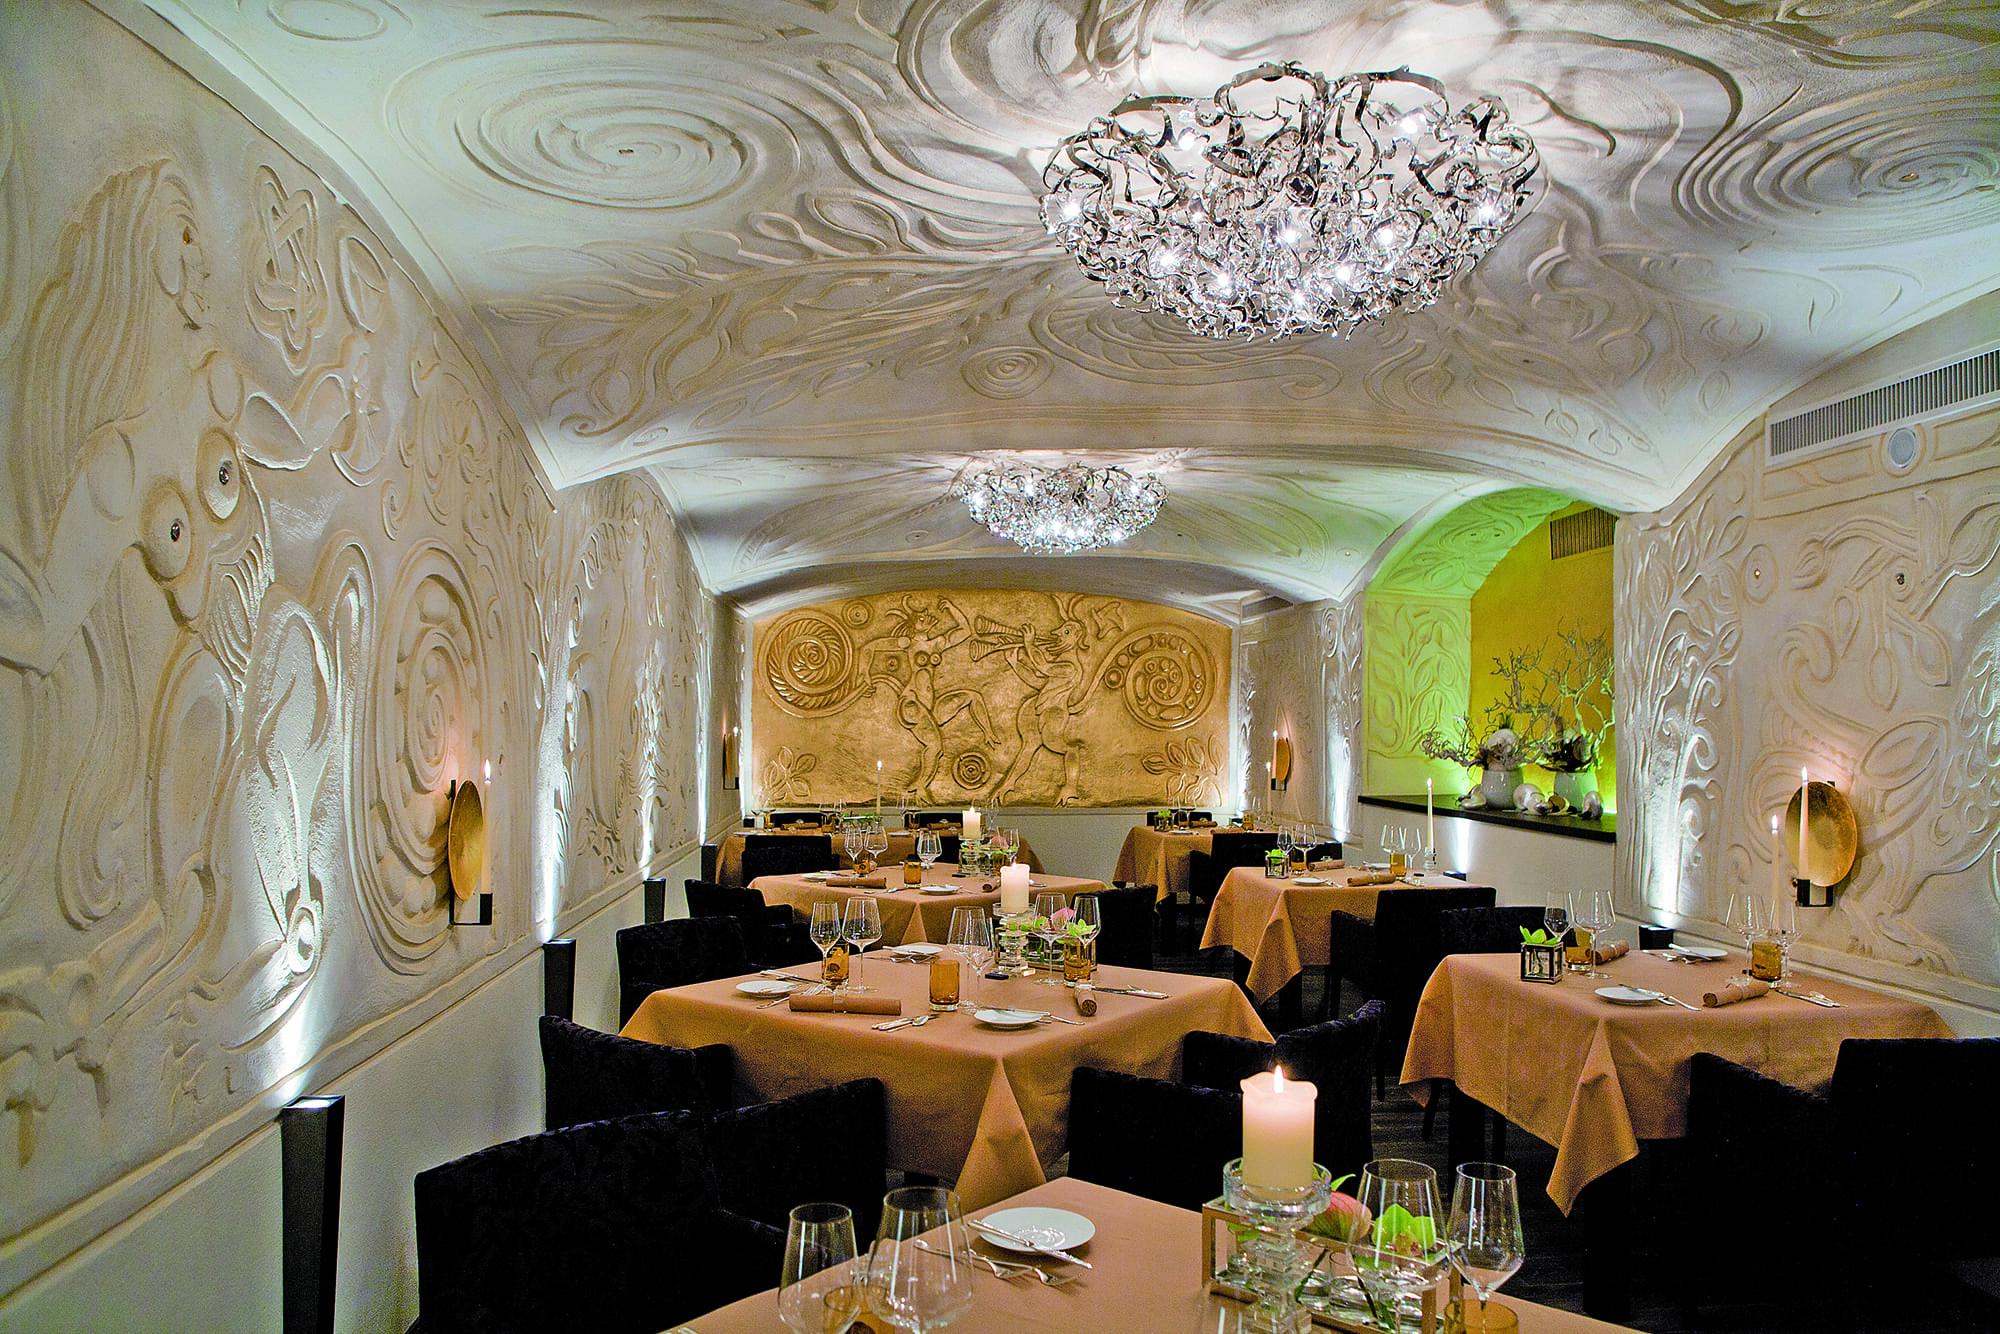 EC_GM_Restaurant_RGB_Low_SAR_02